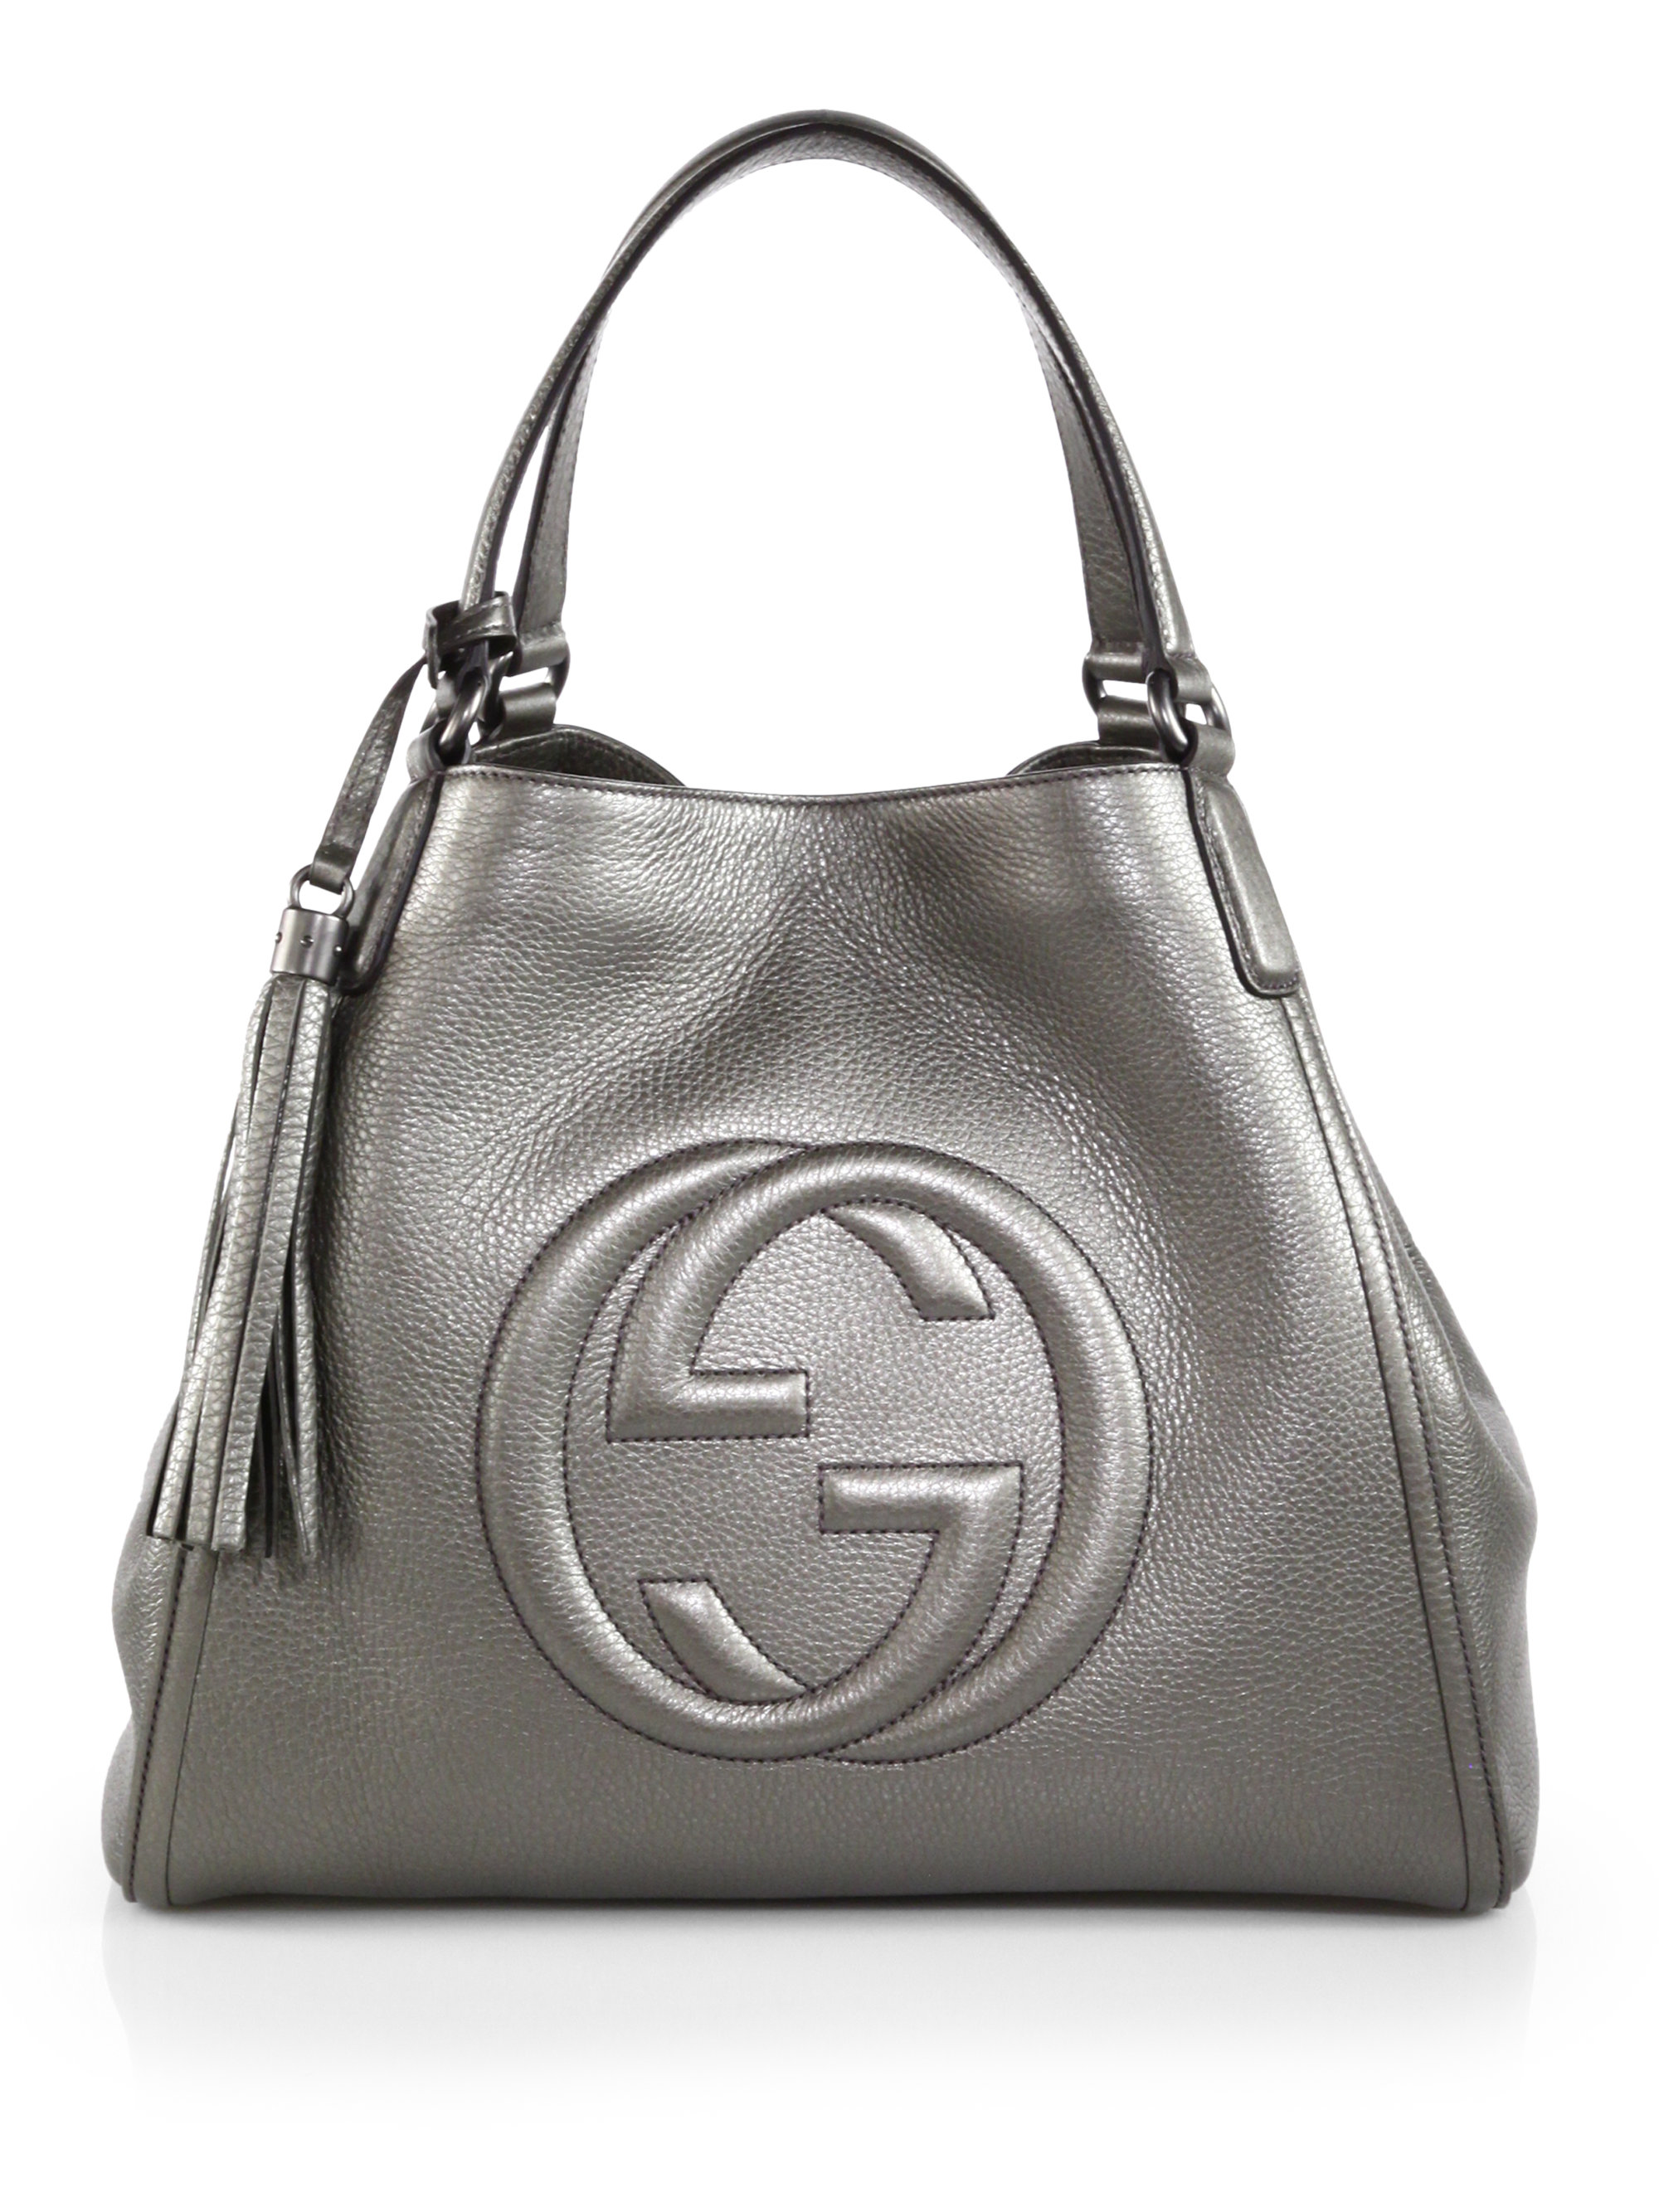 7c37d5f22 Gucci Soho Metallic Leather Shoulder Bag in Metallic - Lyst